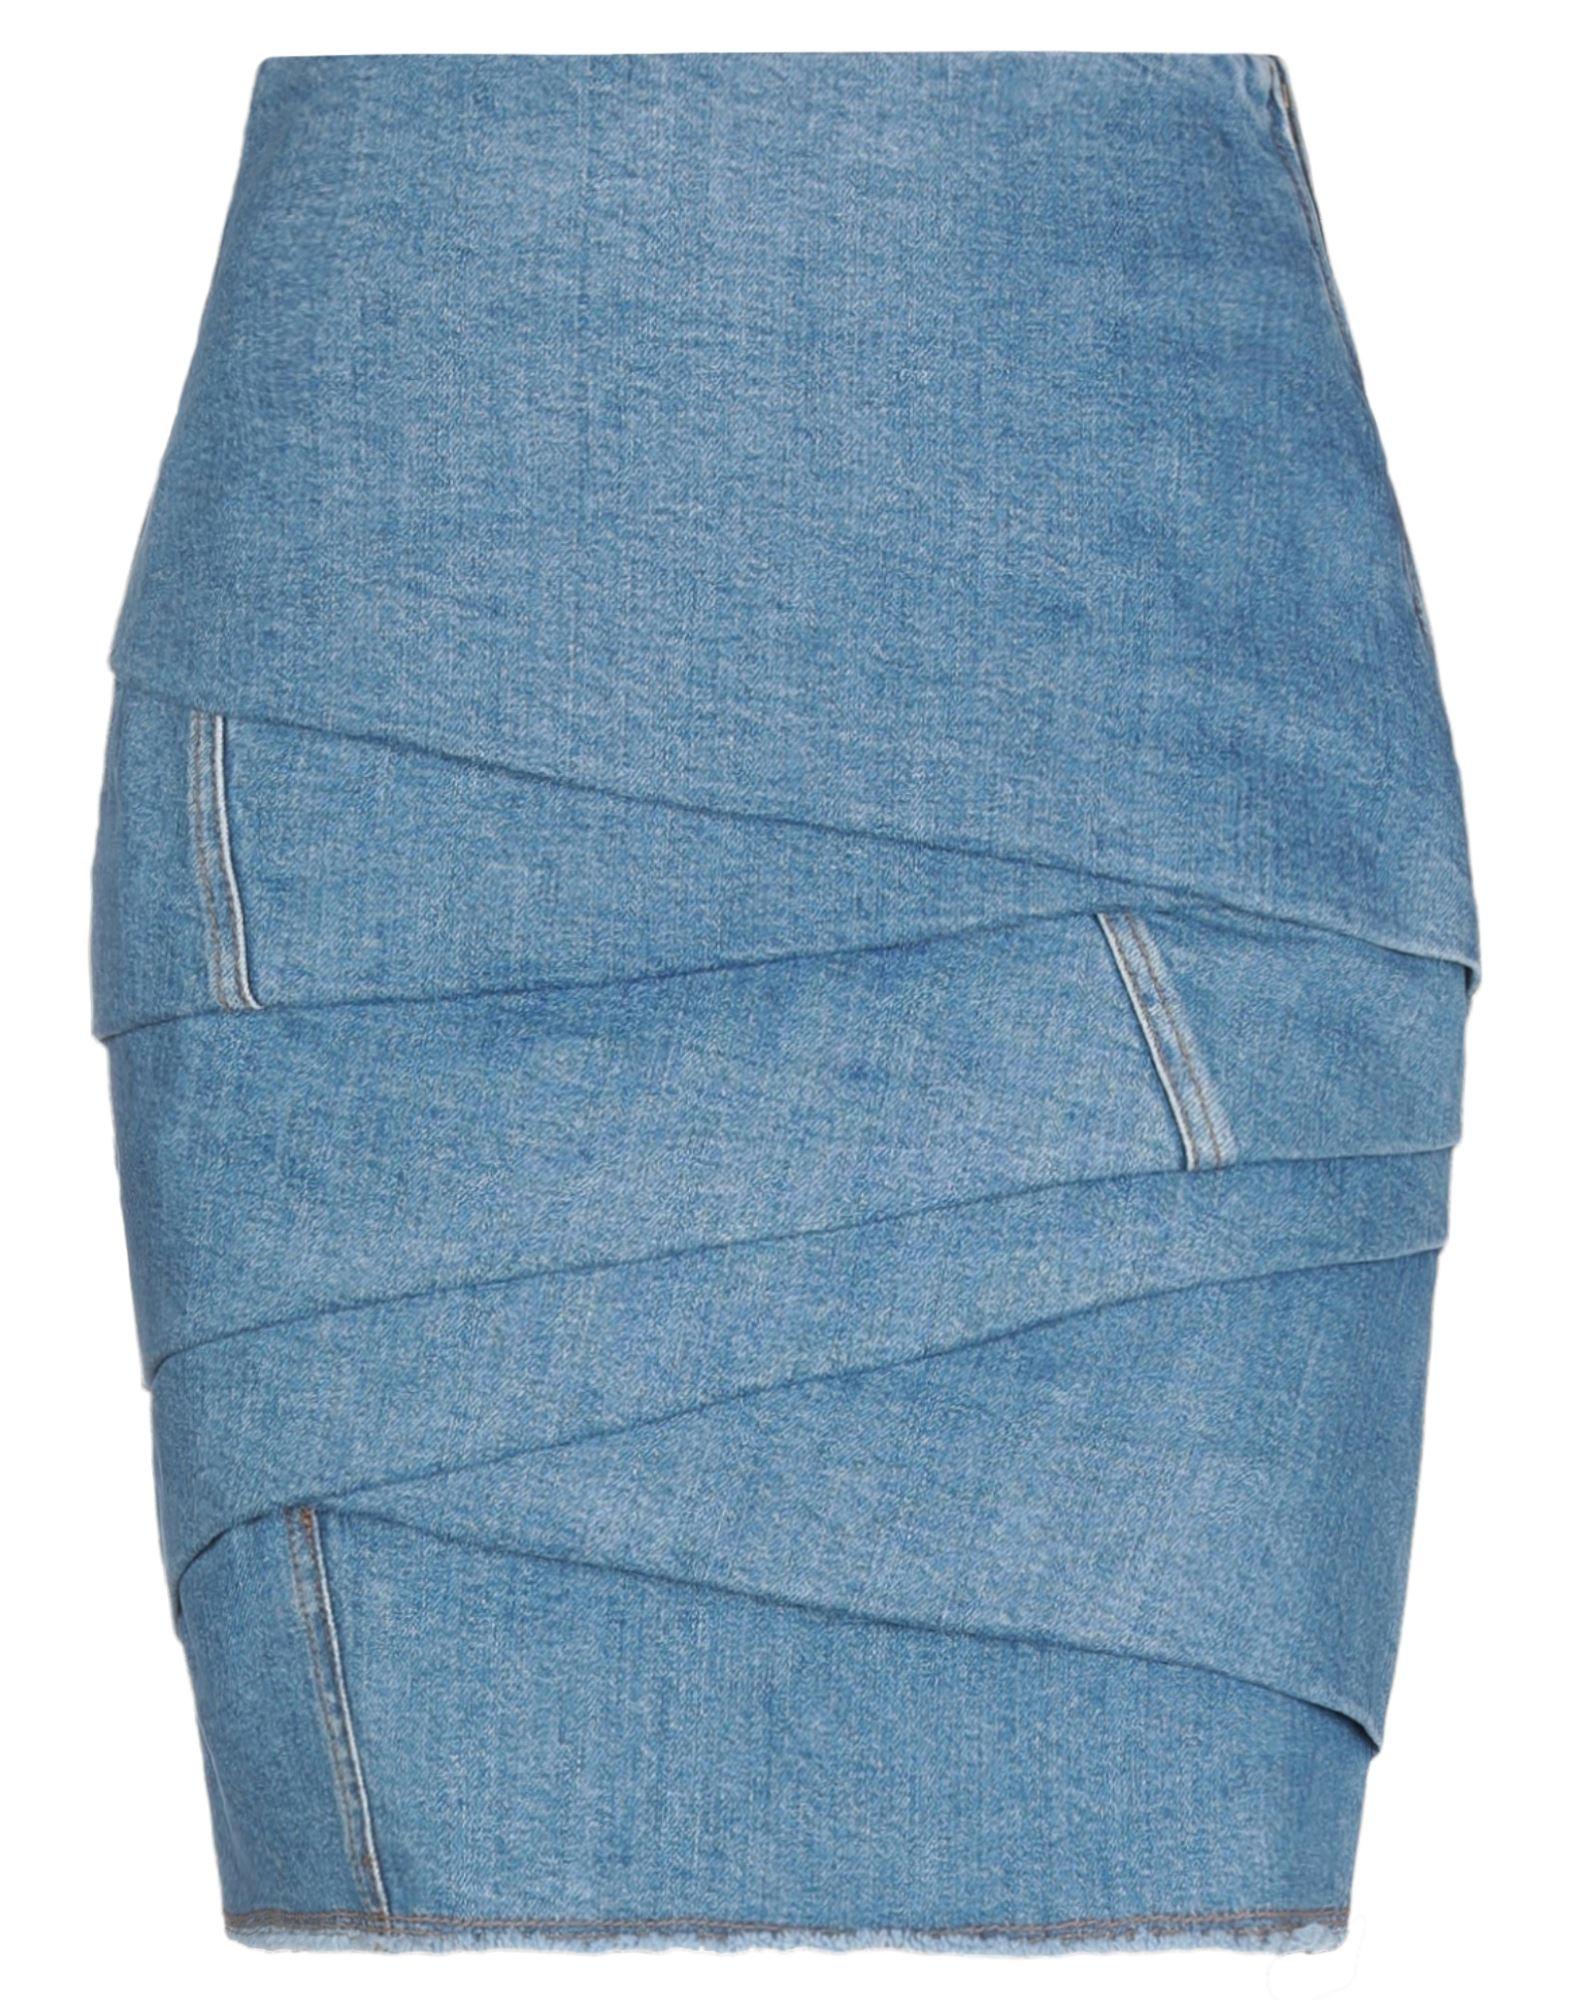 Фото - PHILOSOPHY di LORENZO SERAFINI Джинсовая юбка philosophy di lorenzo serafini юбка